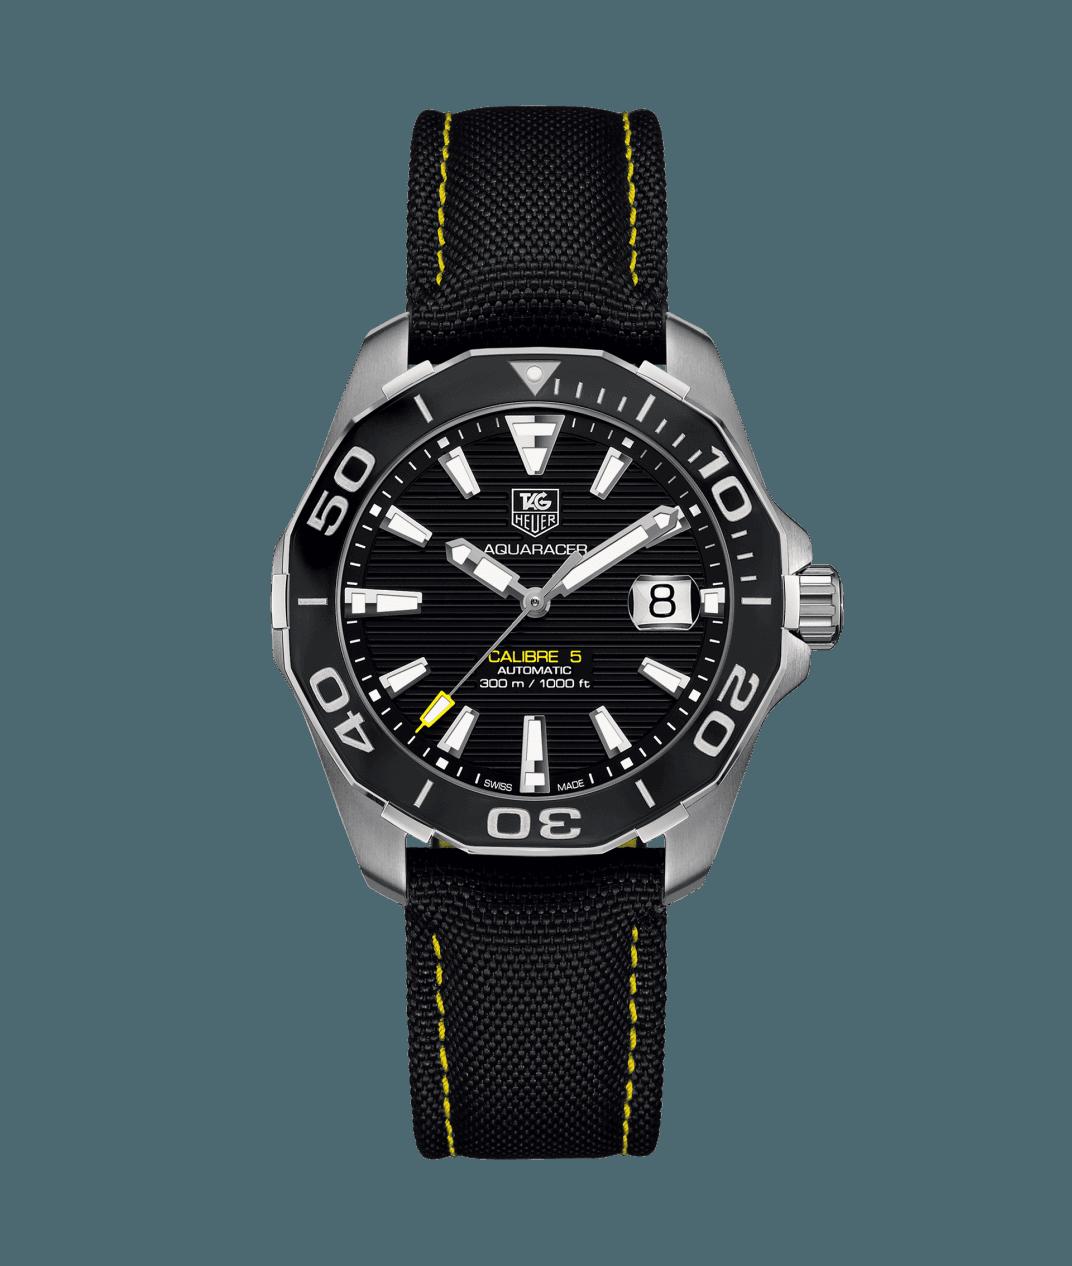 Tag-Heuer-Montre-Aquaracer-Calibre-5-41-mm-Hall-of-Time-WAY211A-FC6362